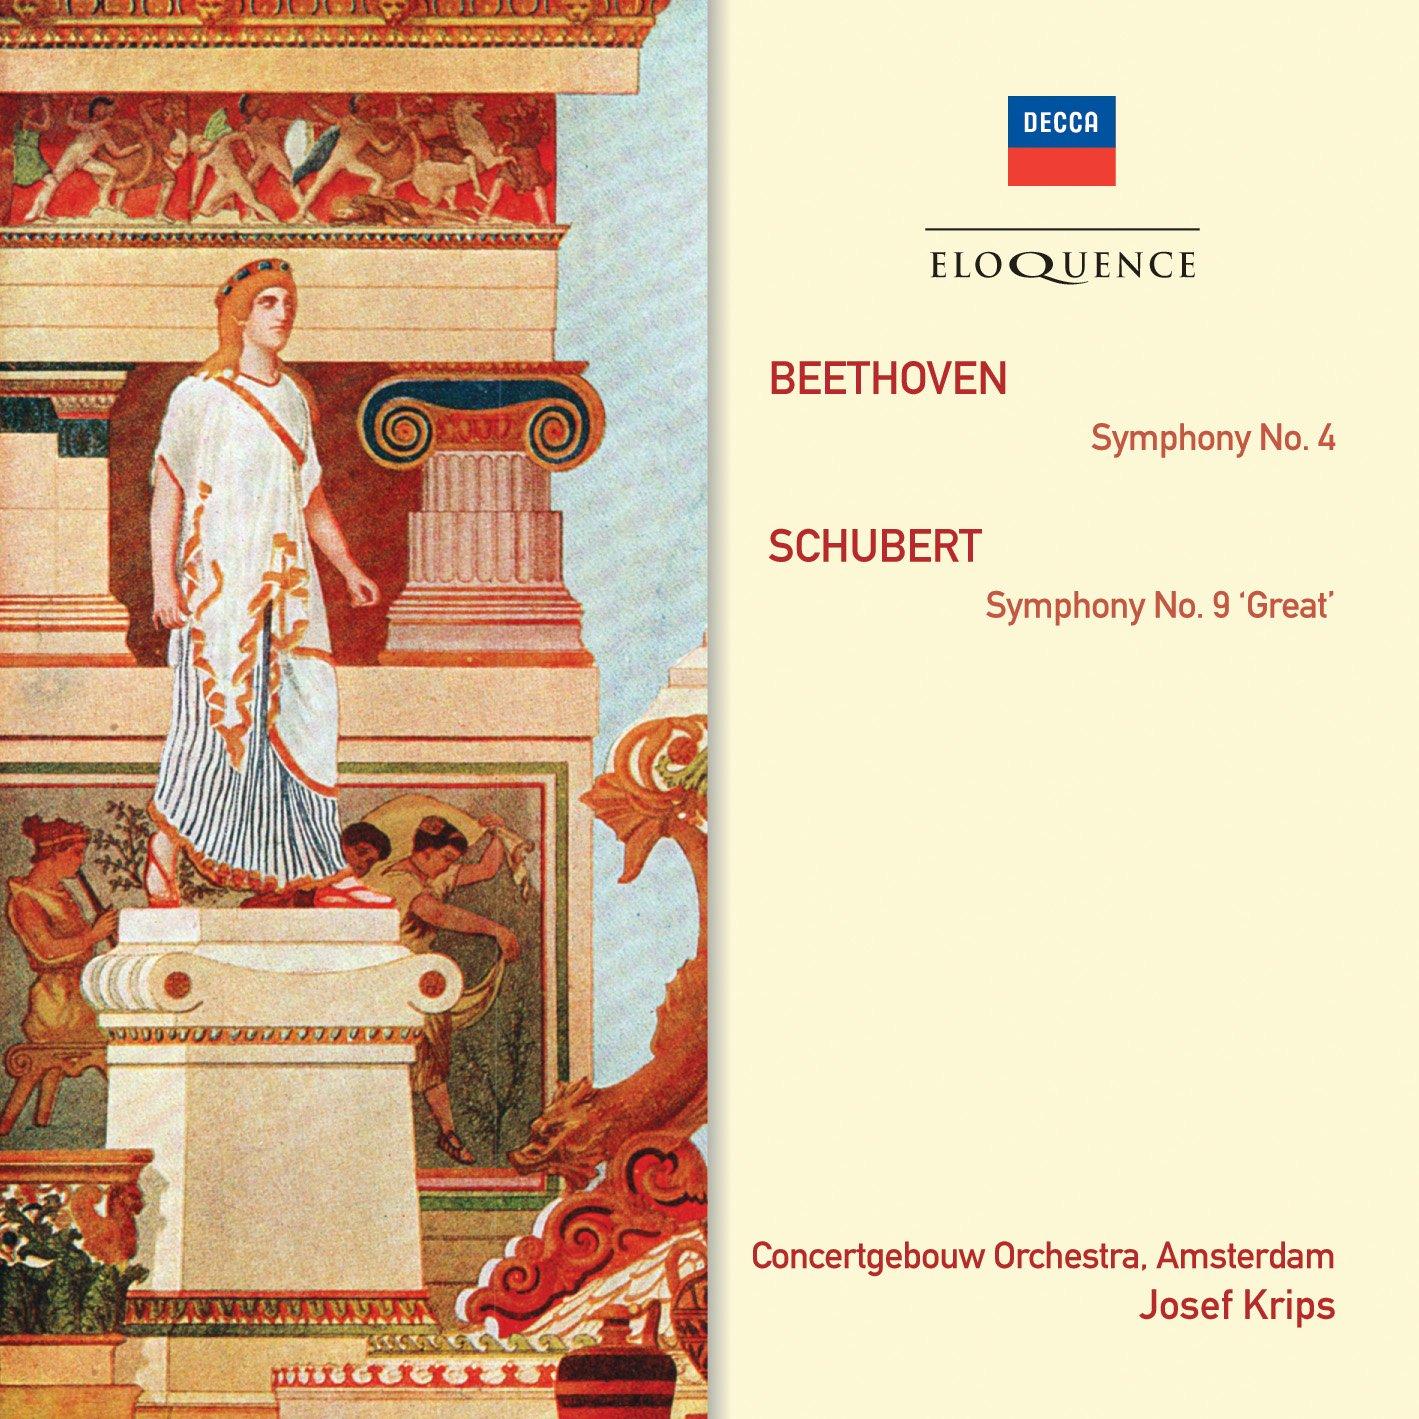 CD : Royal Concertgebouw Orchestra - Eloquence: Beethoven - Symphony No 4 / Schubert